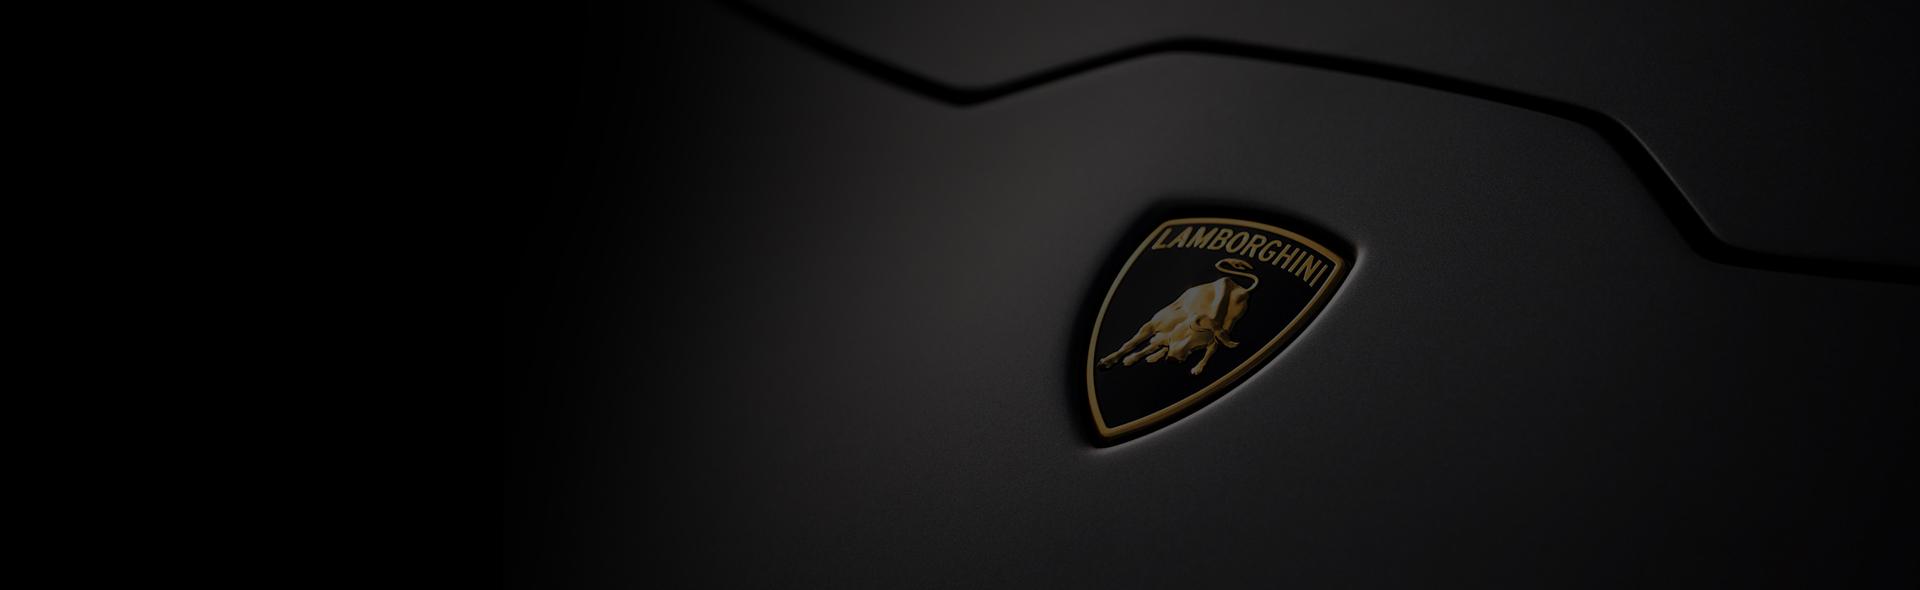 Banner Lamborghini